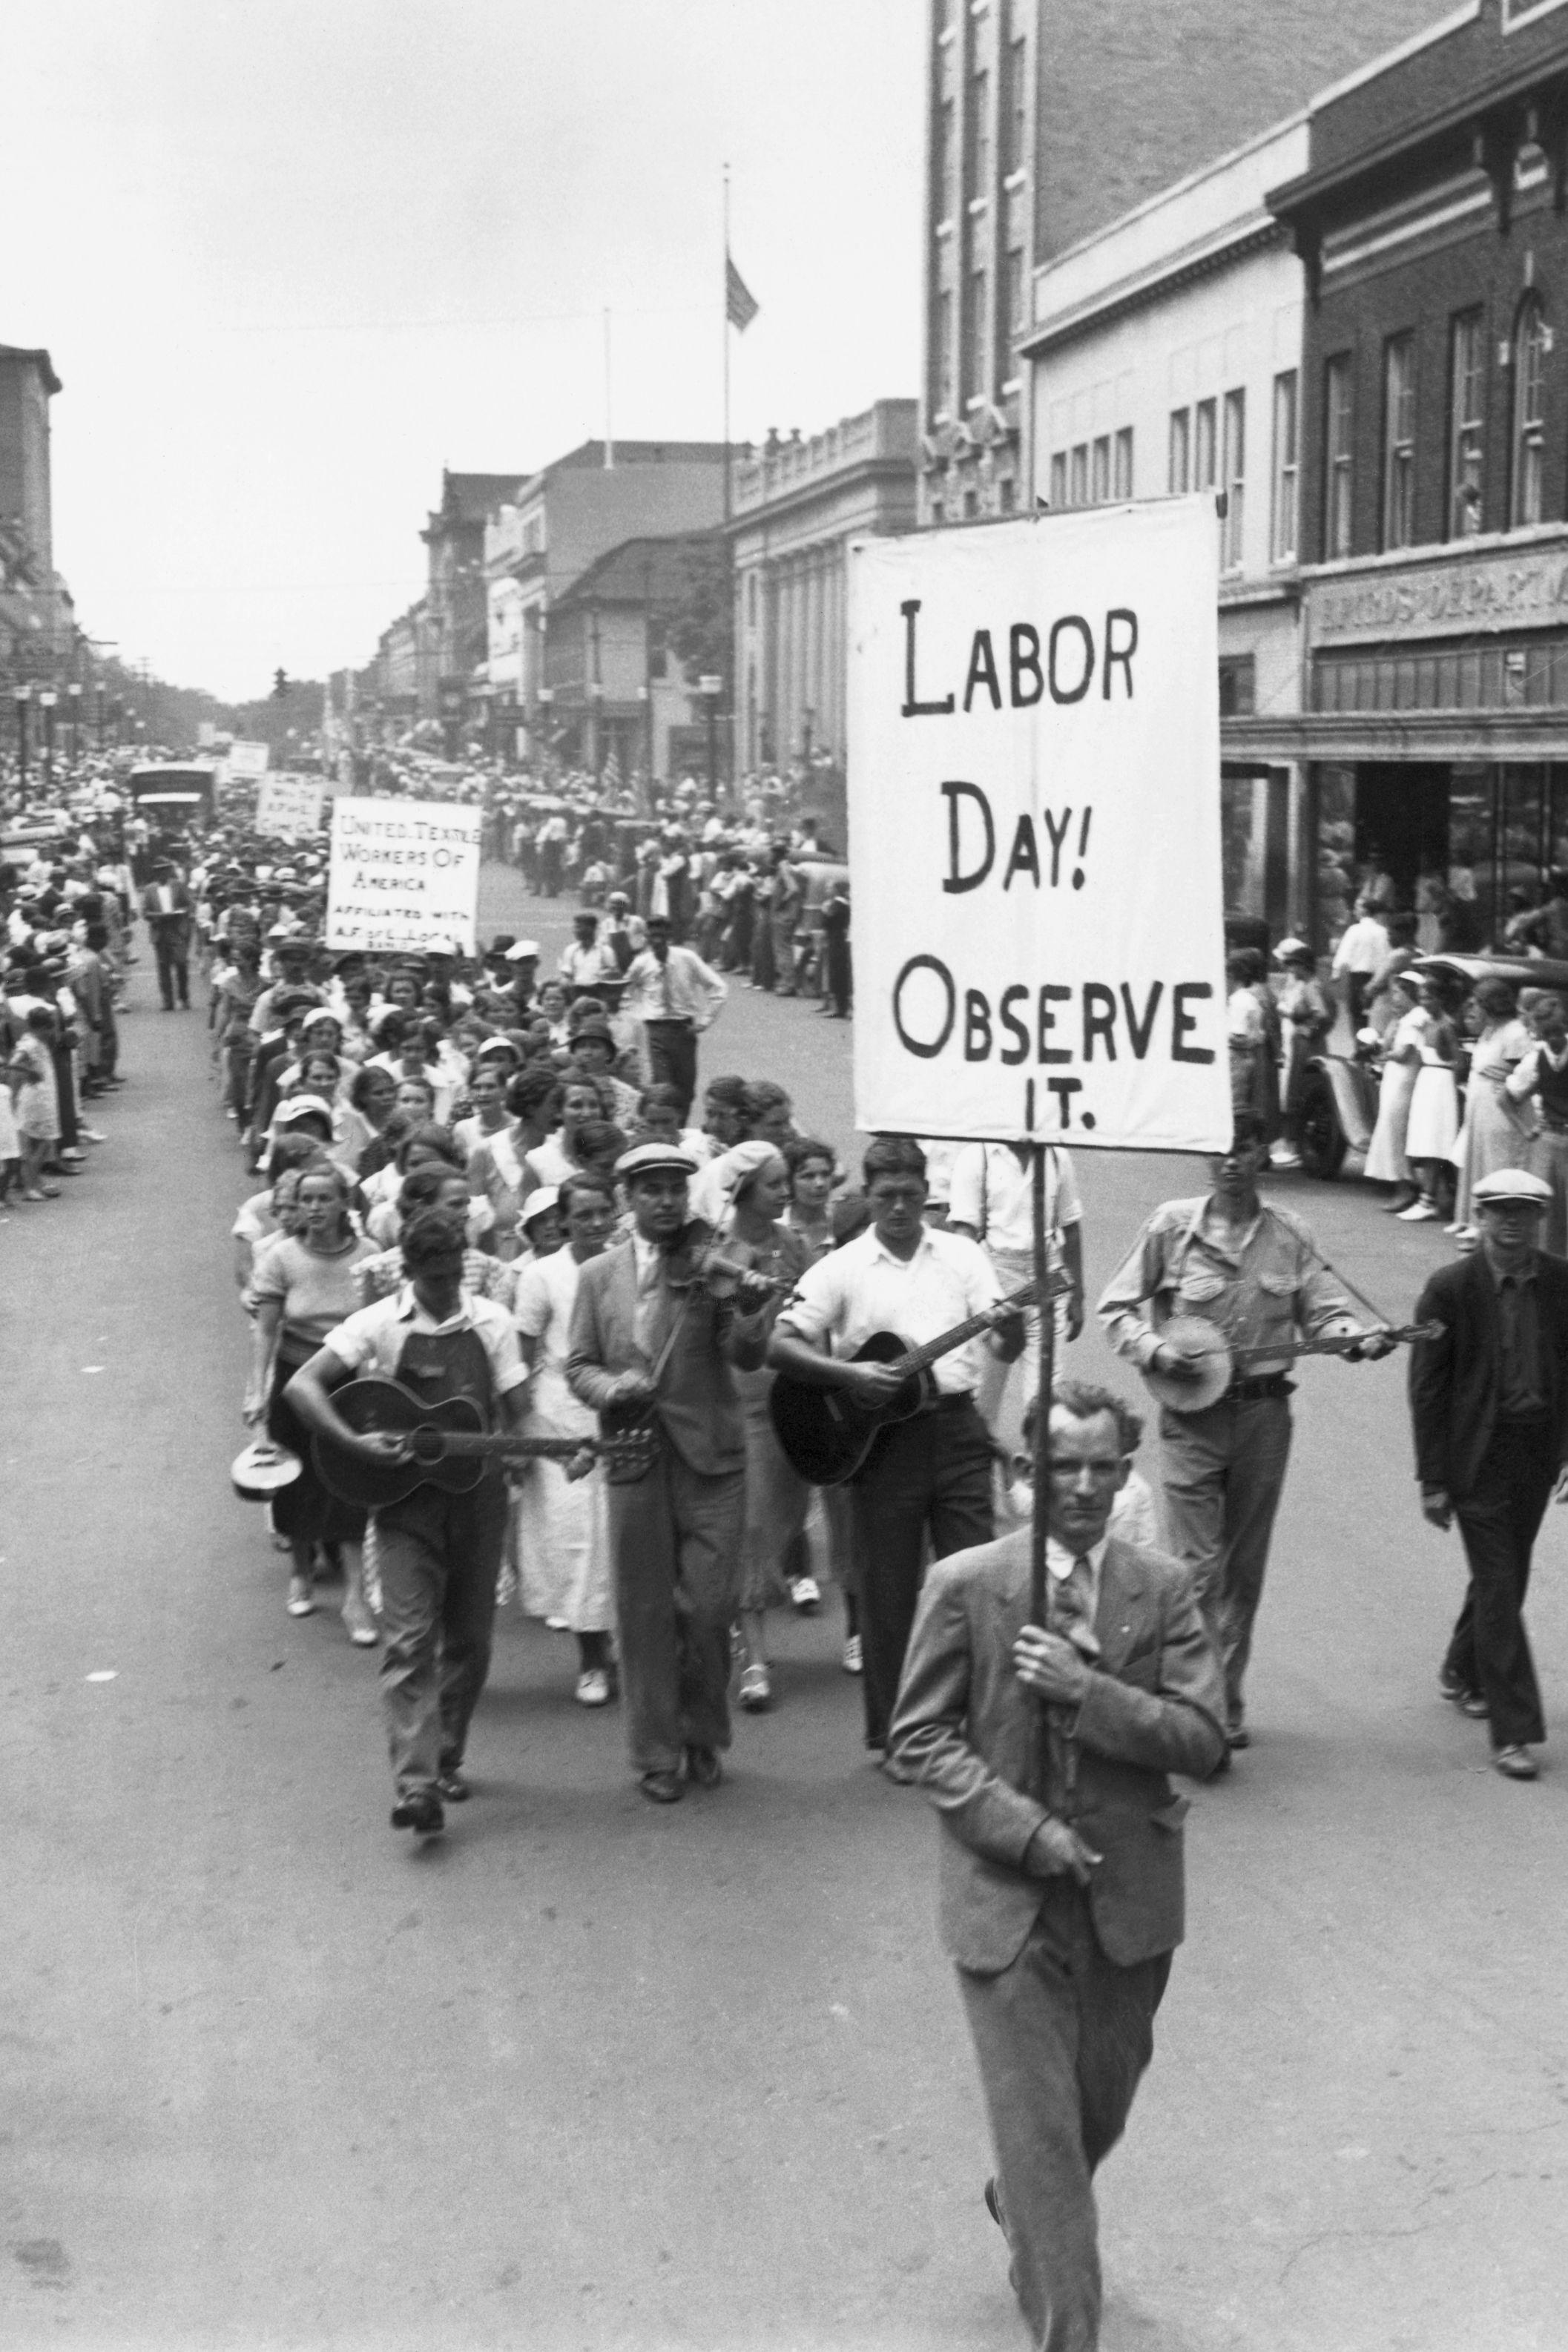 labor day parade - labor day trivia